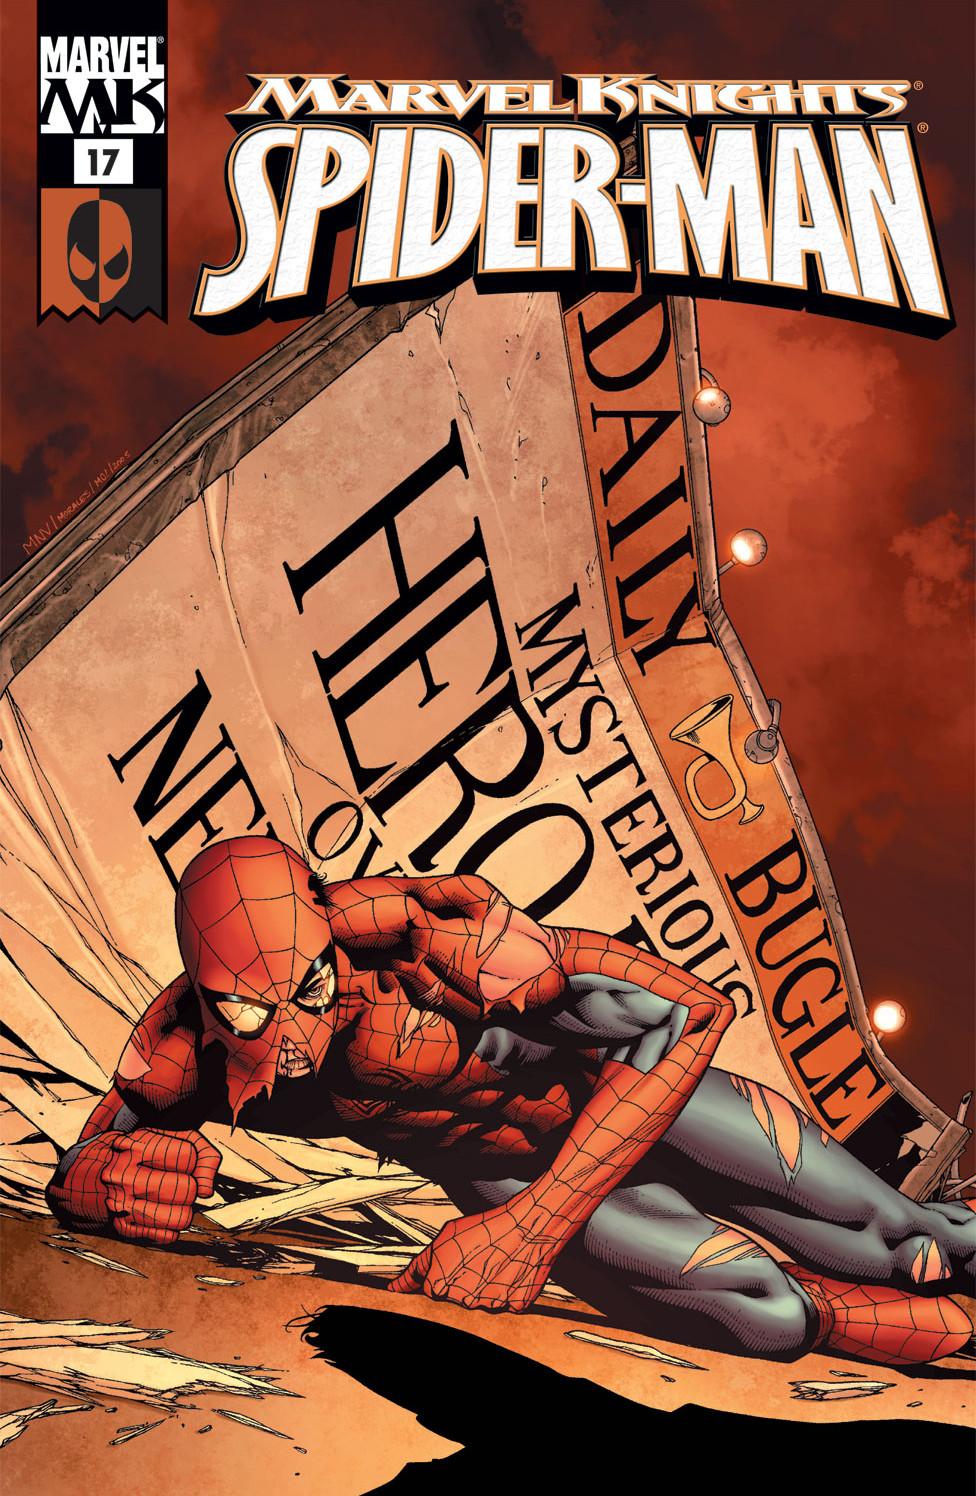 http://img3.wikia.nocookie.net/__cb20080902003515/marveldatabase/images/3/3e/Marvel_Knights_Spider-Man_Vol_1_17.jpg